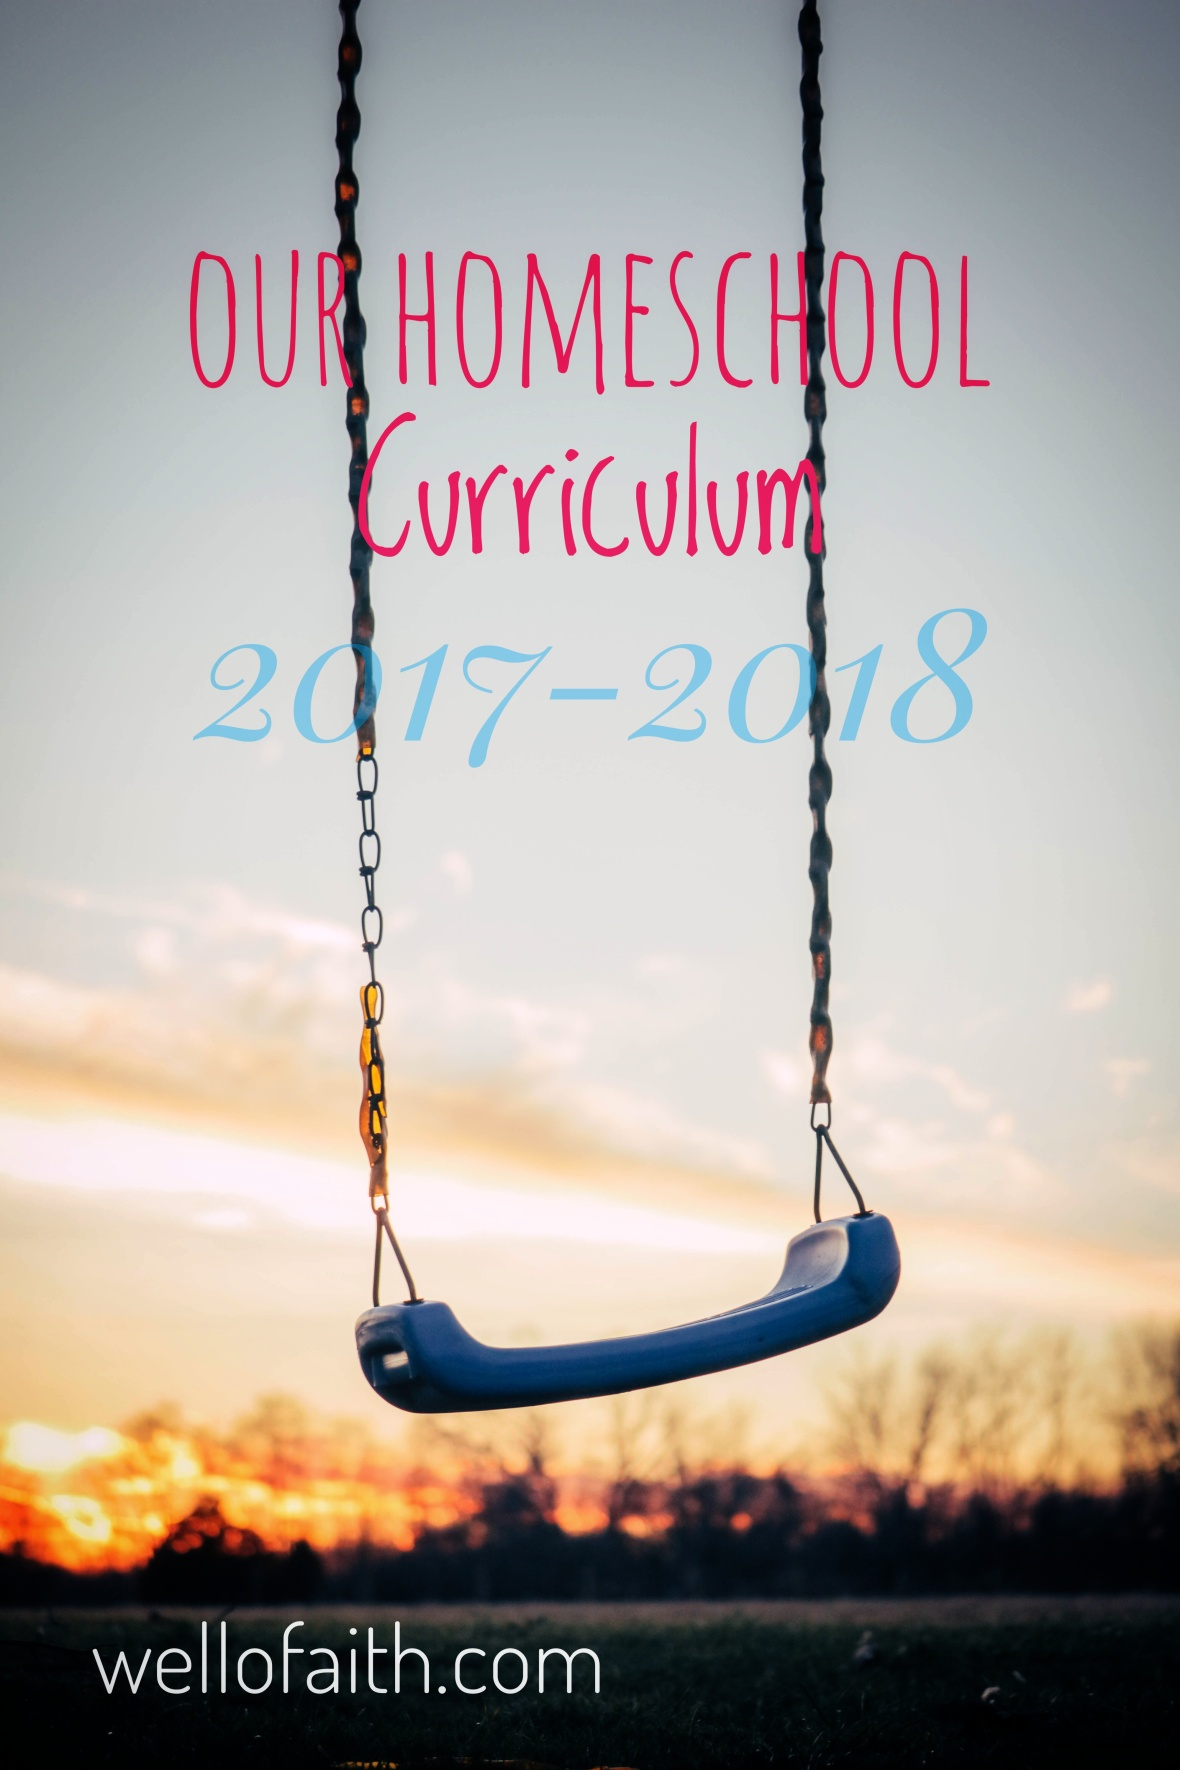 Our Homeschool Curriculum 2017-2018